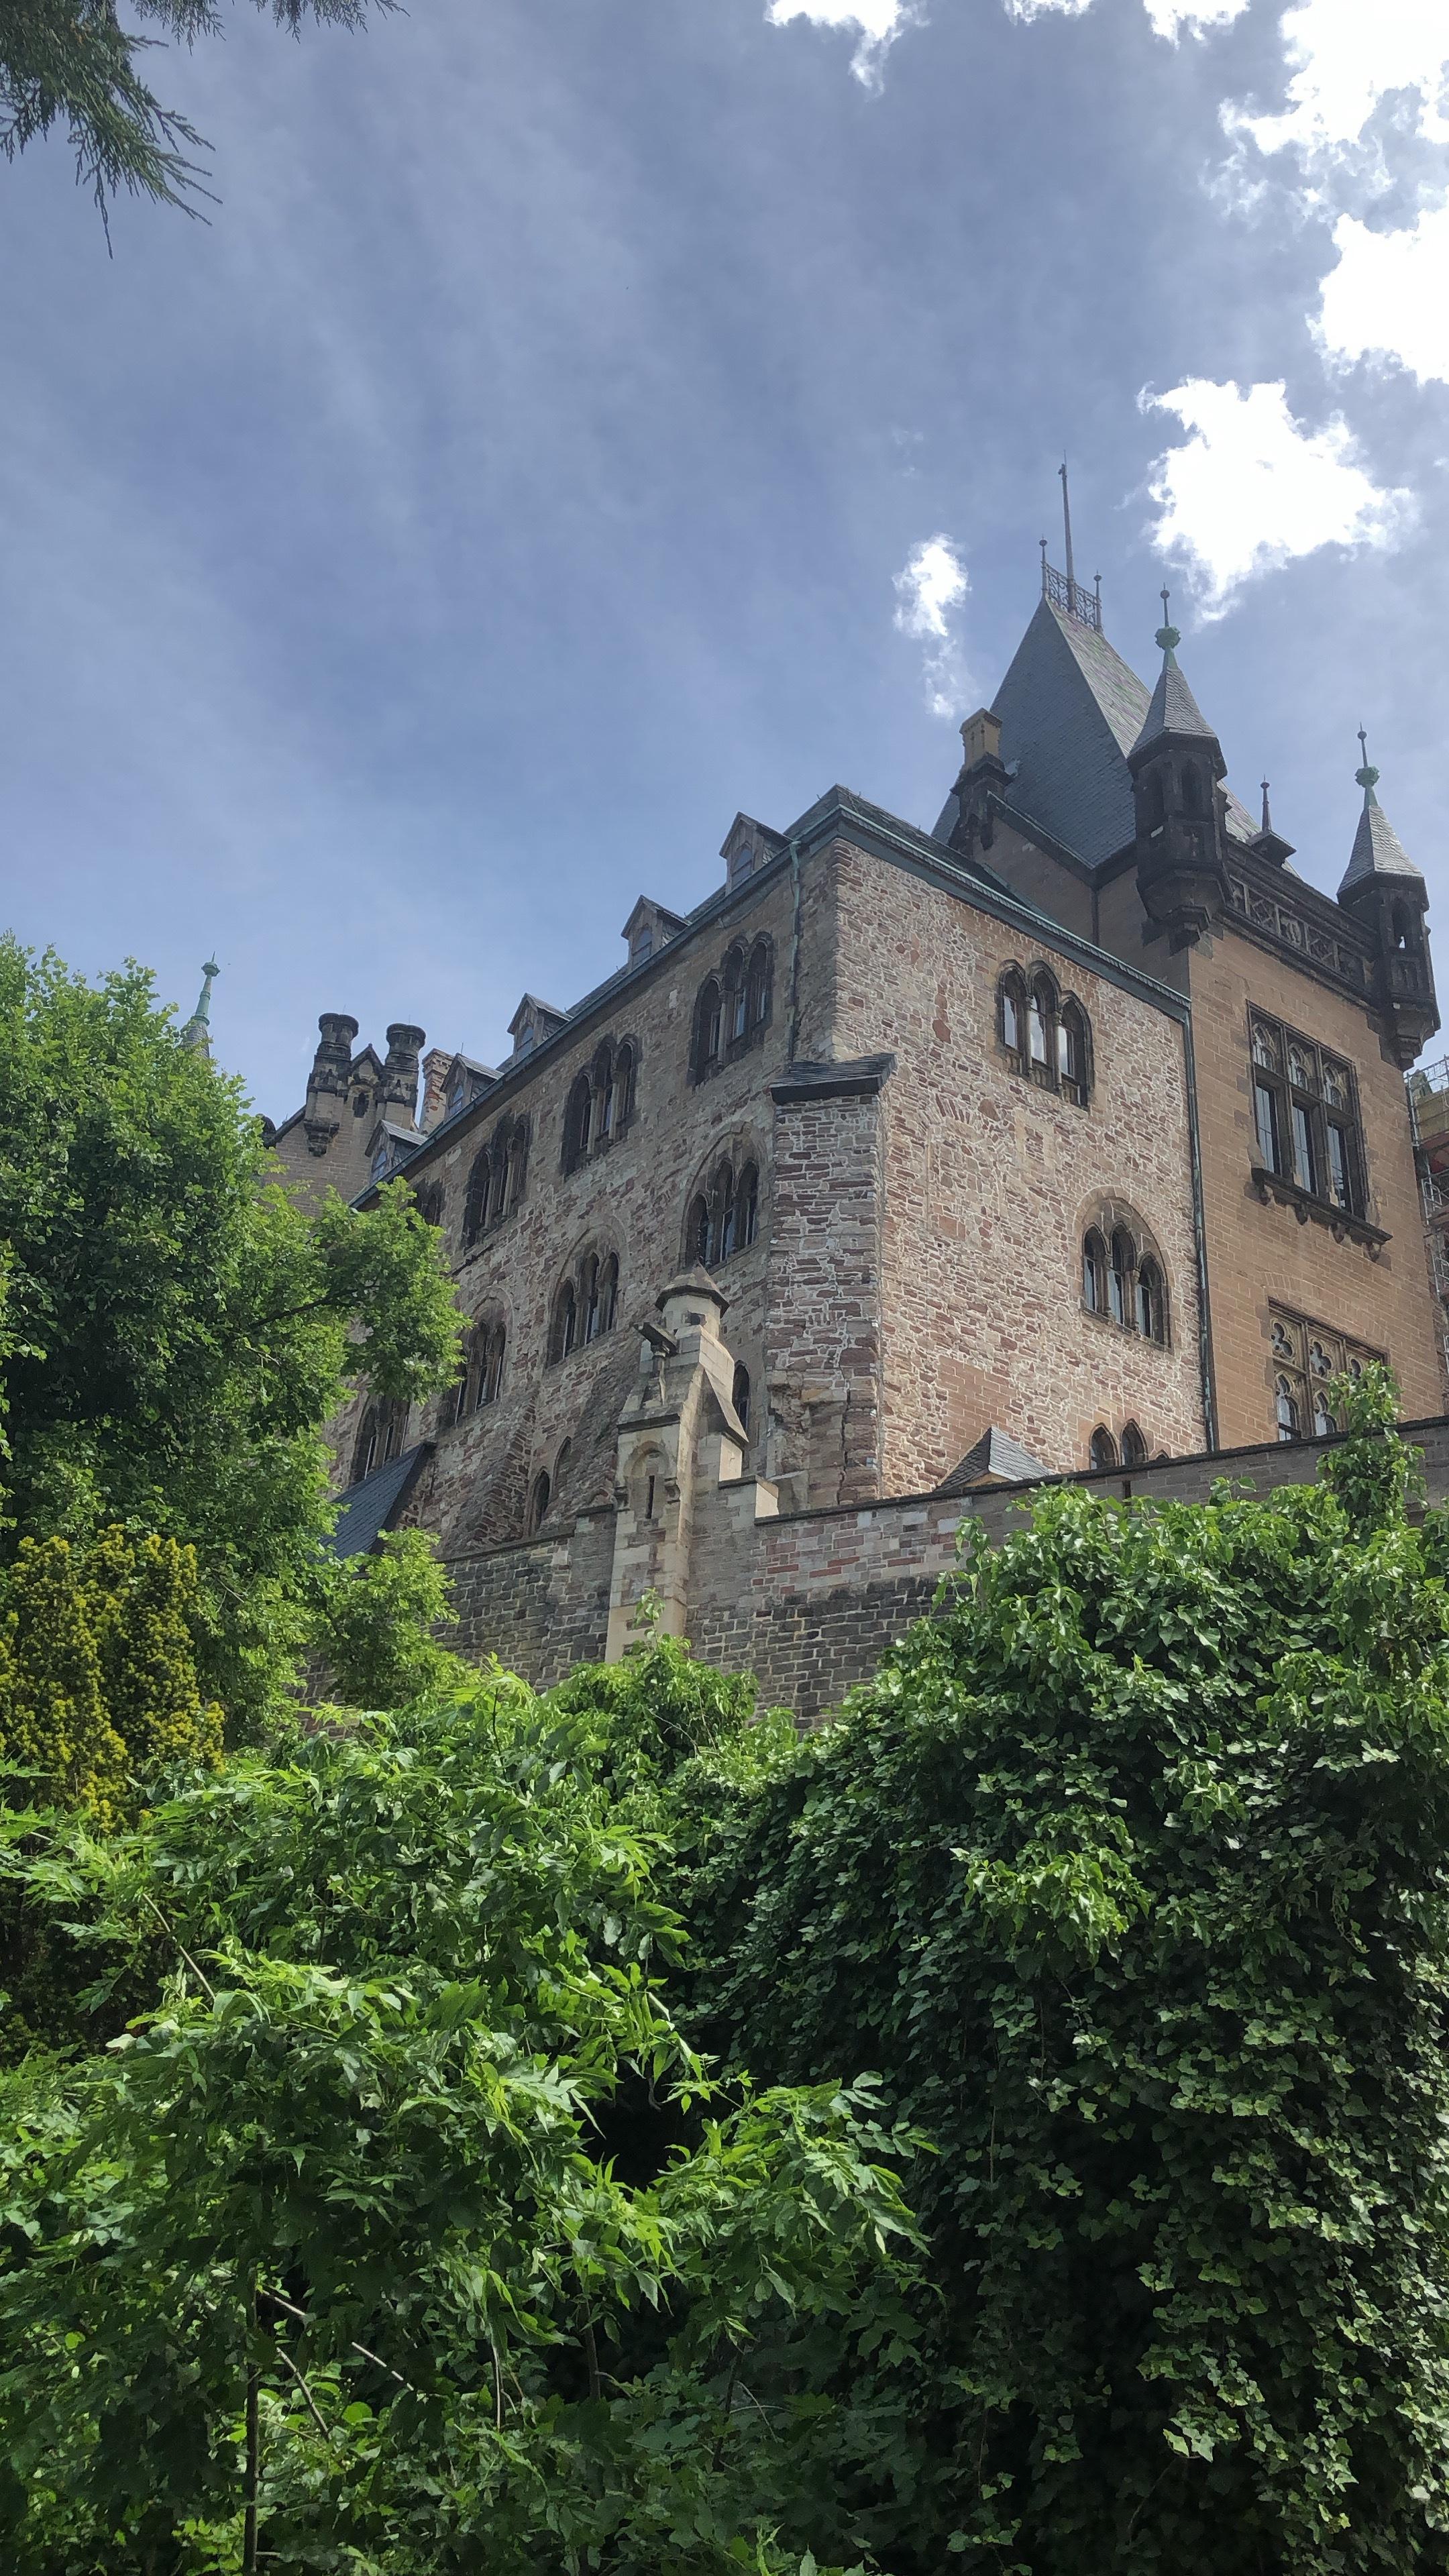 Teile des Schlosses stammen aus dem 12. Jahrhundert.  ©ADELSWELT